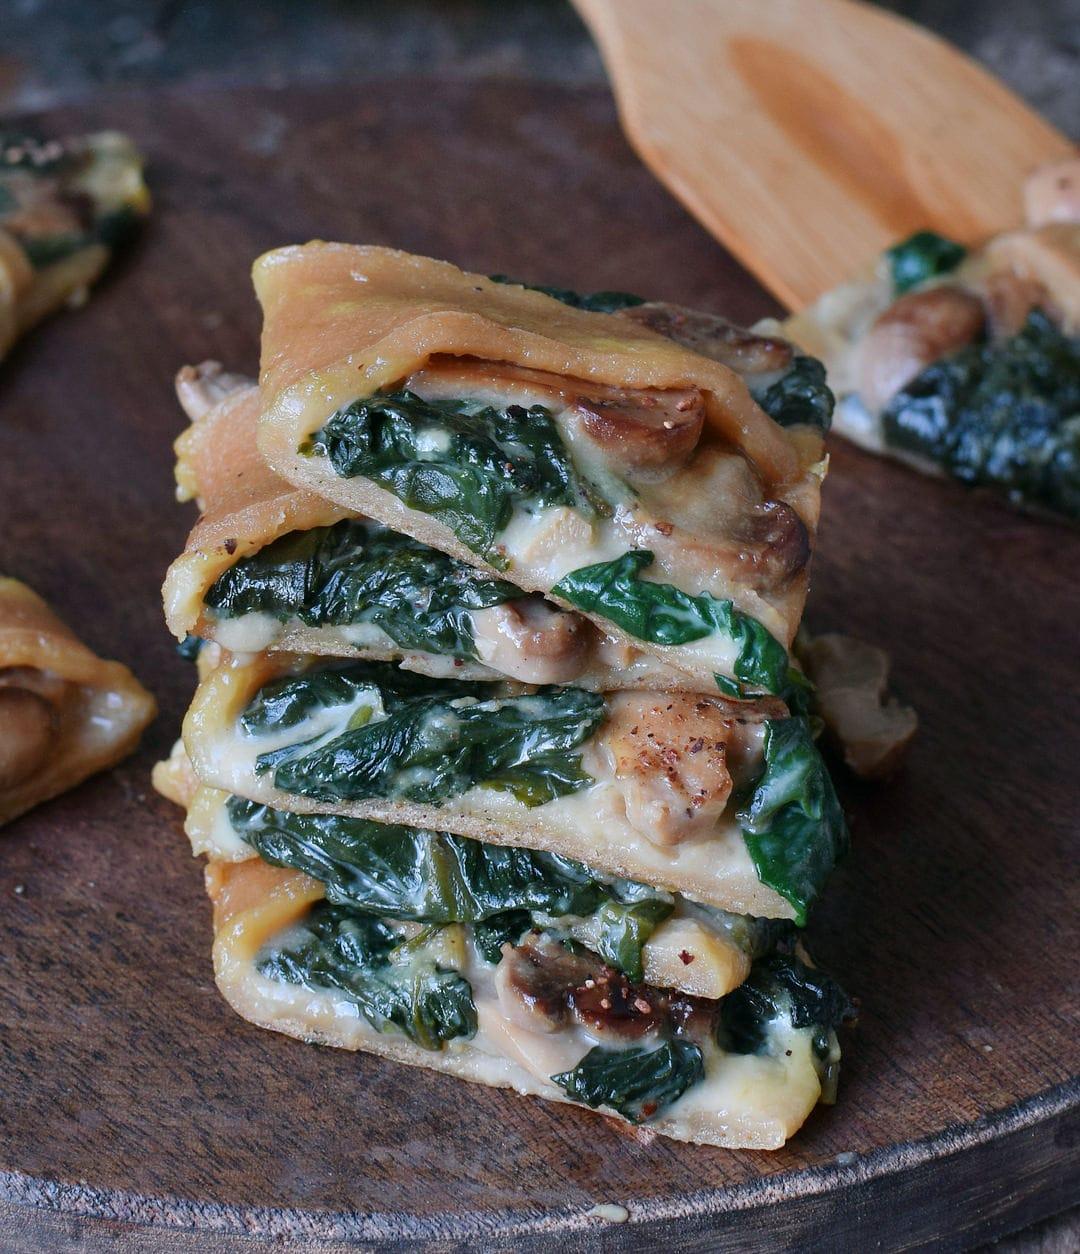 Pizza Stapel mit Spinat Pilzen und veganem Käse